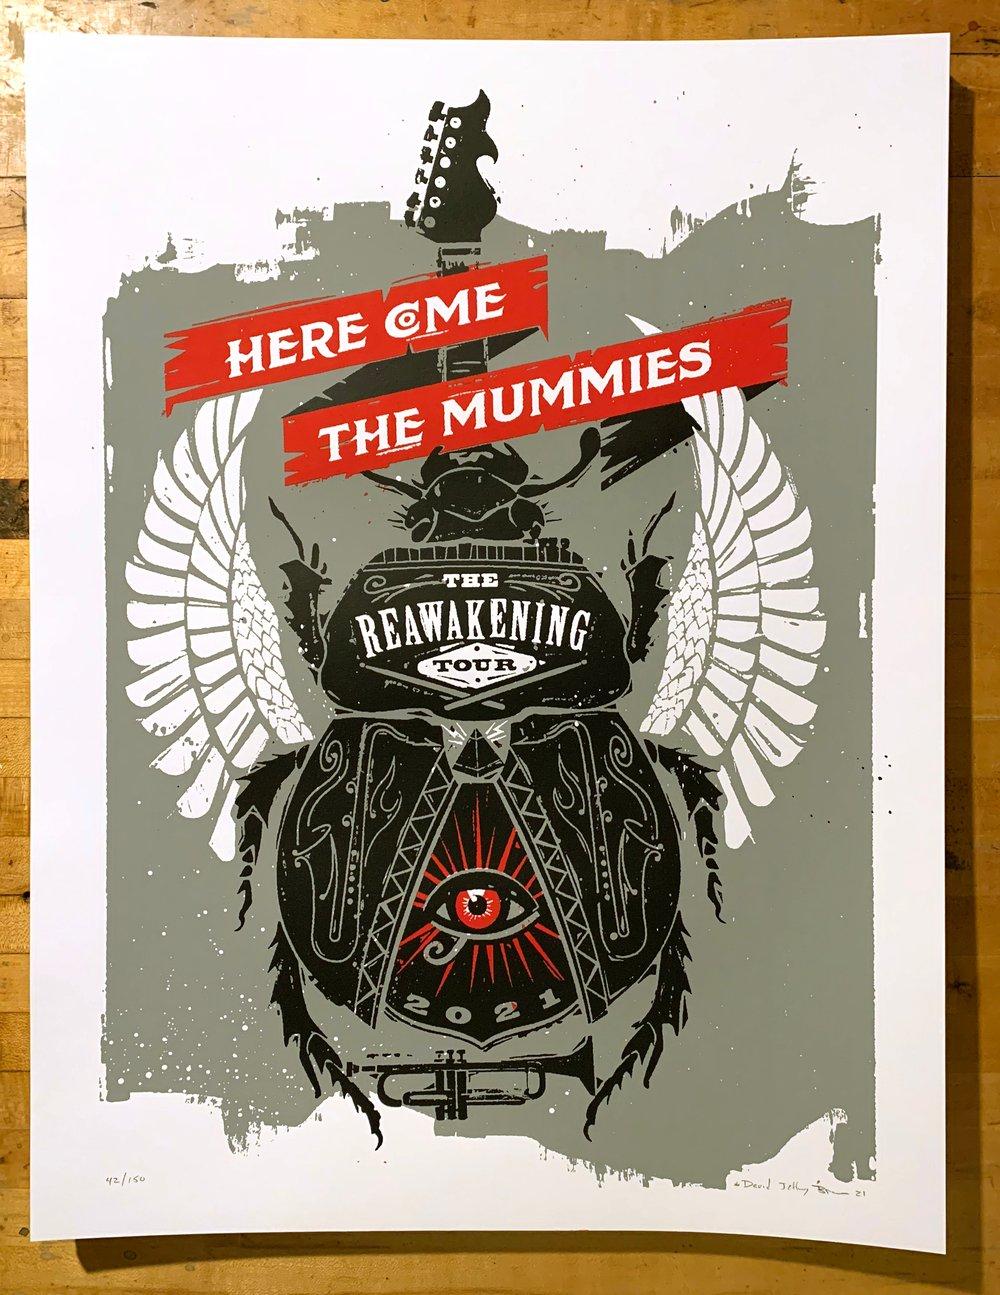 Here Come the Mummies - Reawakening Tour 2021